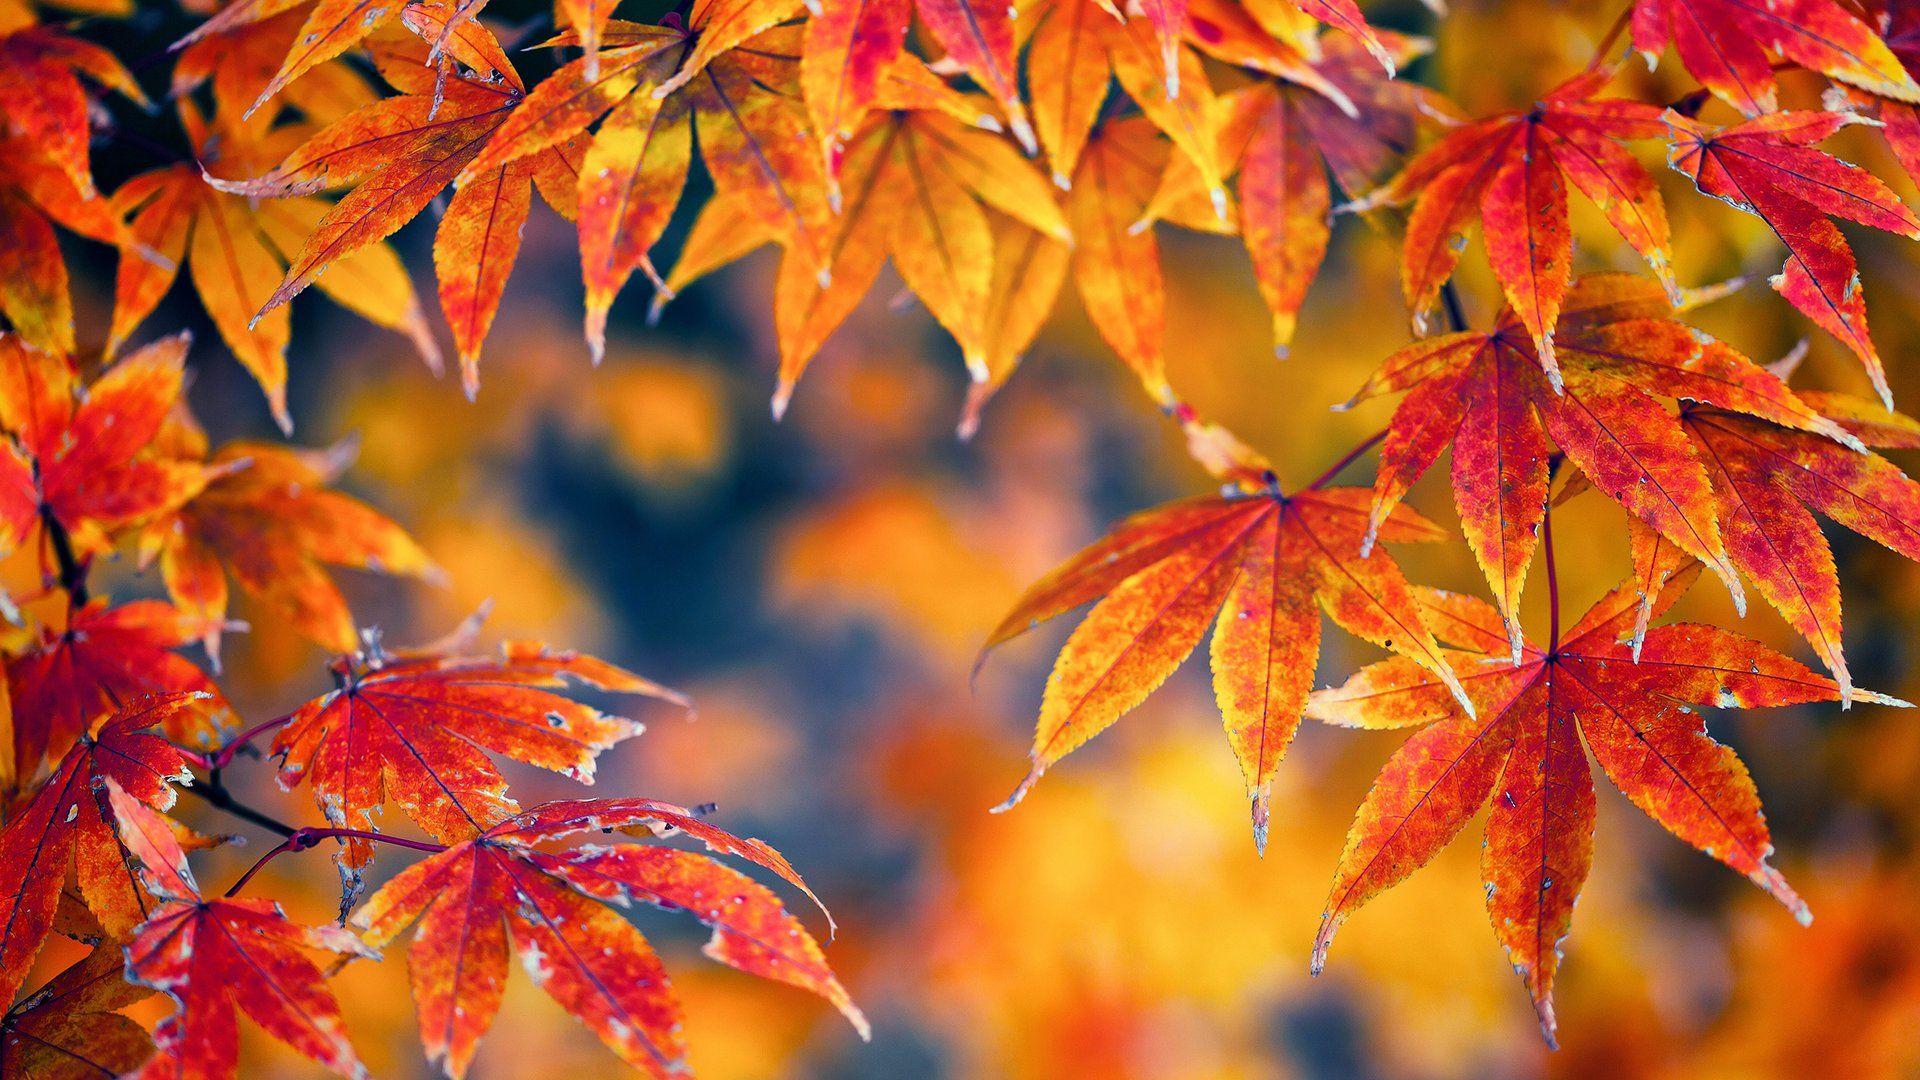 Foliage desktop wallpaper download